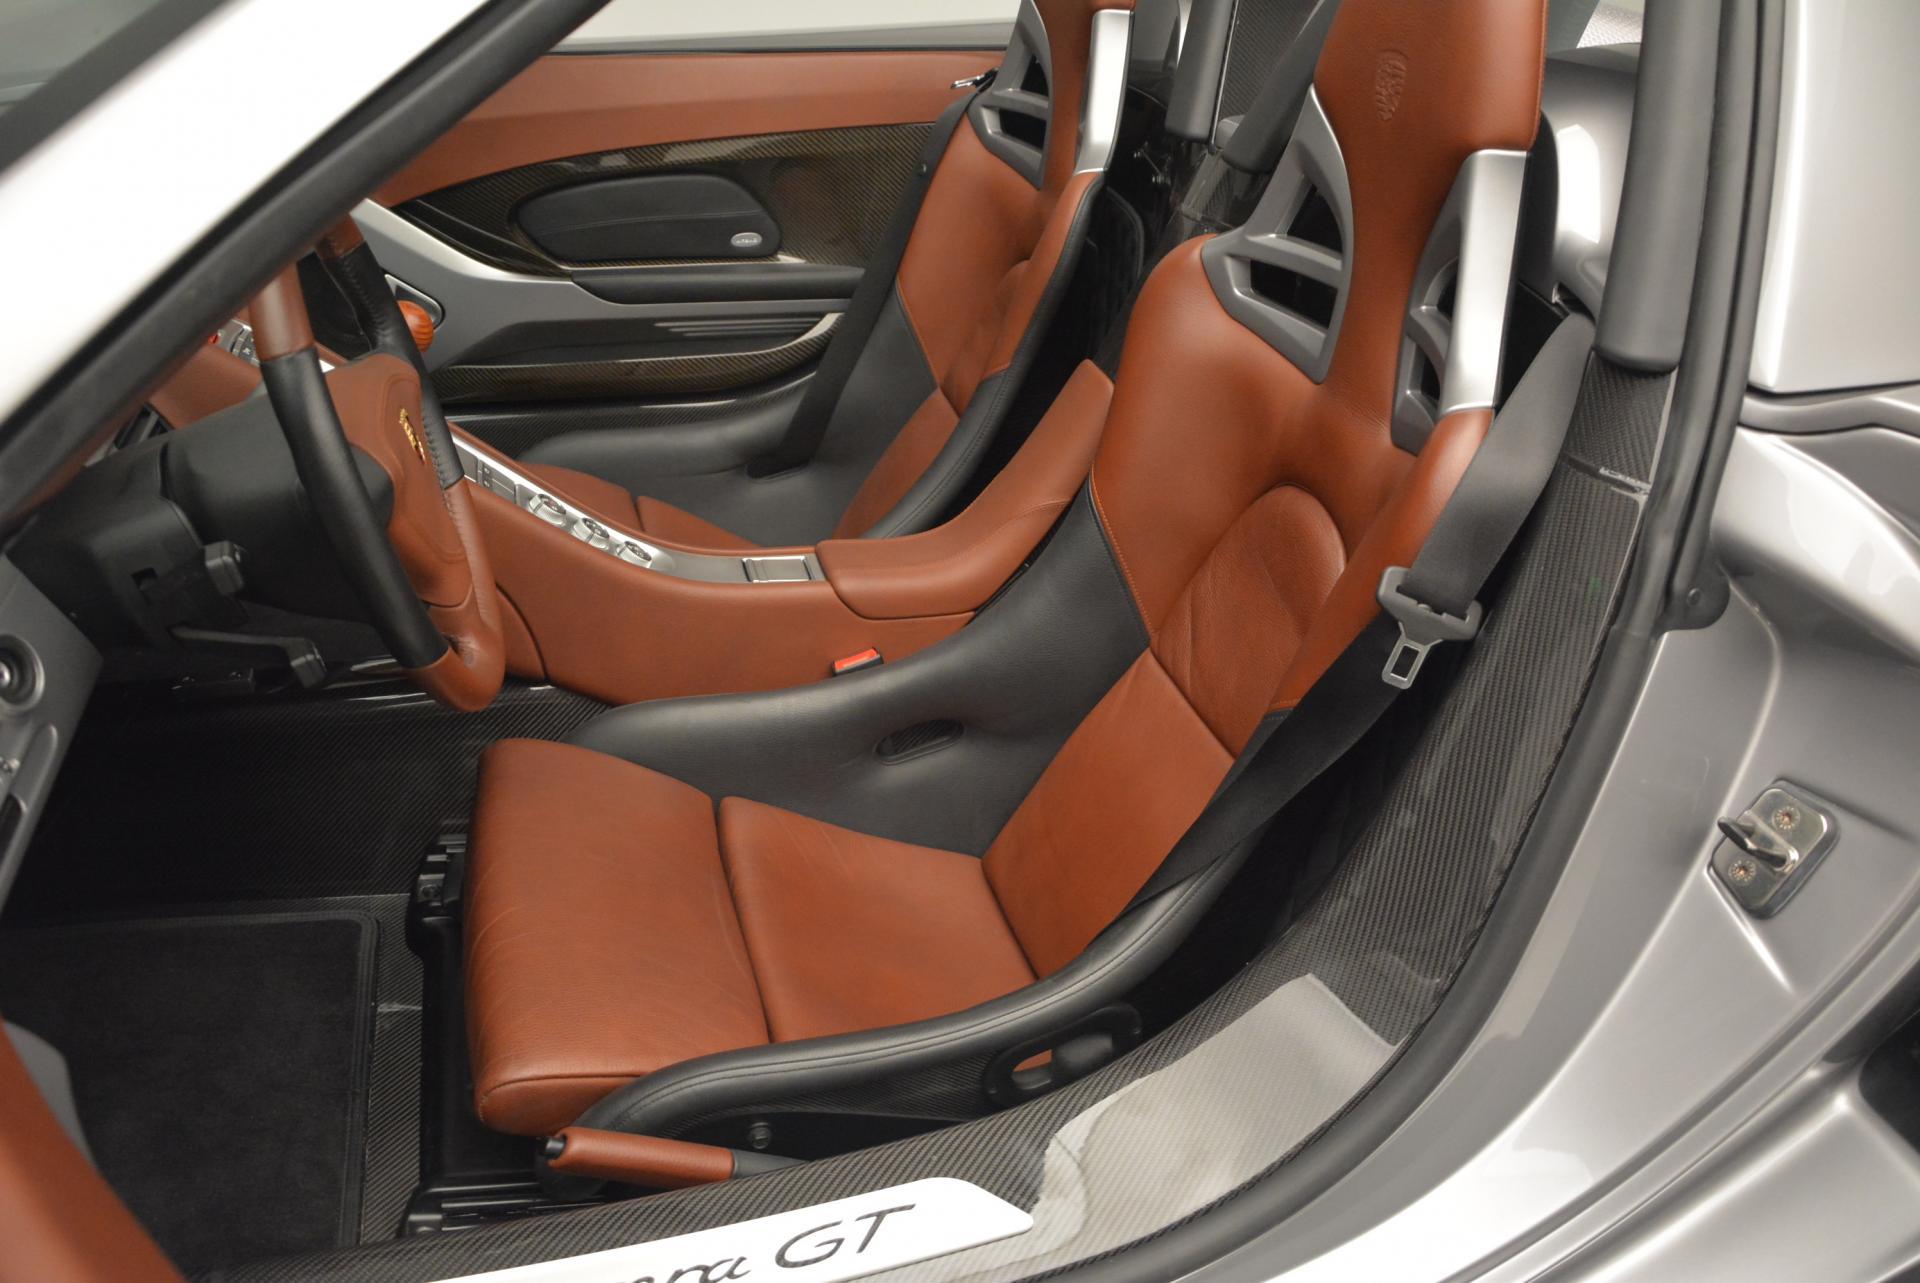 Used 2005 Porsche Carrera GT  For Sale In Greenwich, CT 108_p18